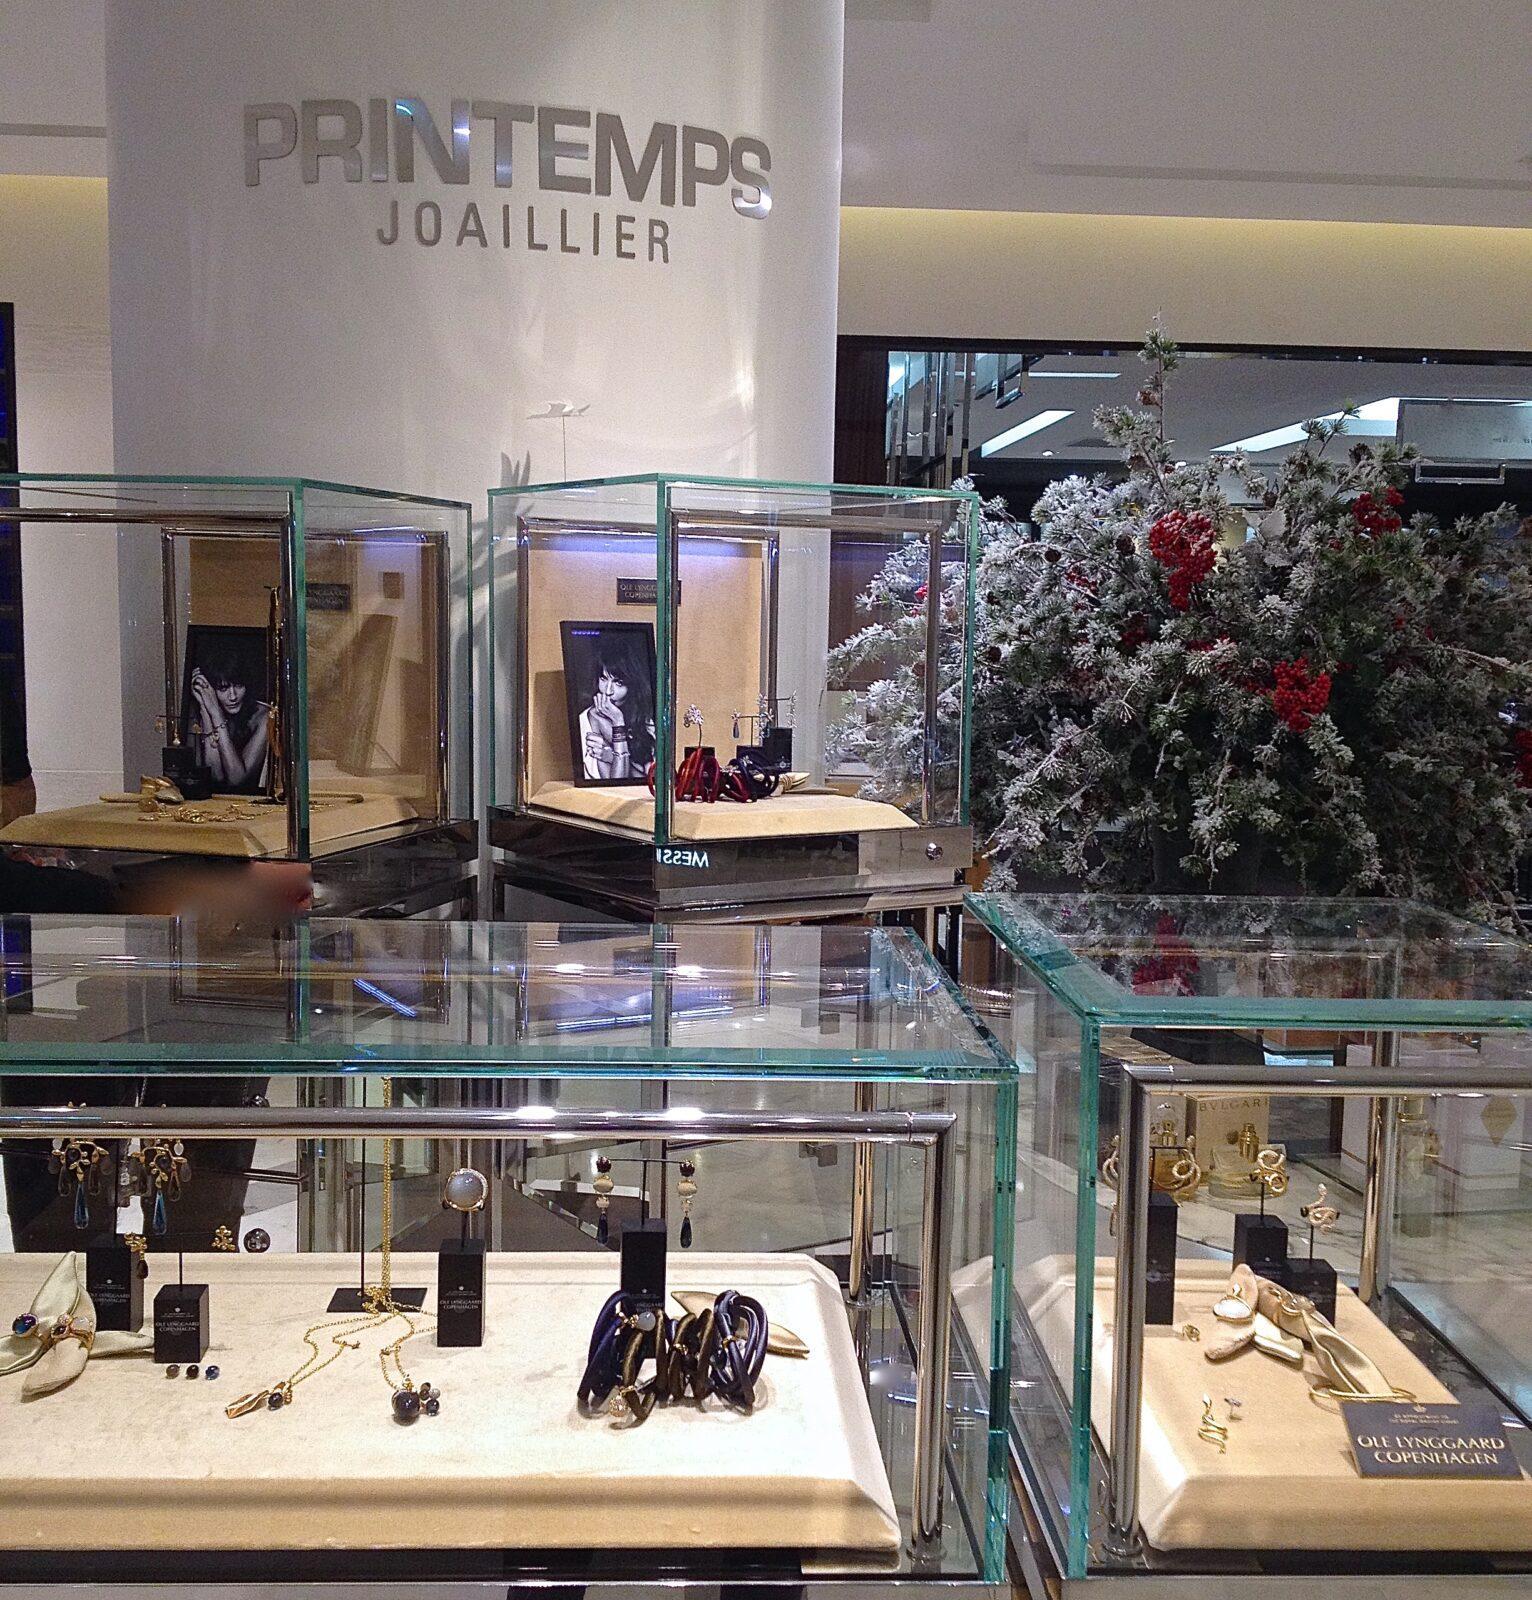 Ole lynggaard esprit joaillerie - Esprit magasins paris ...